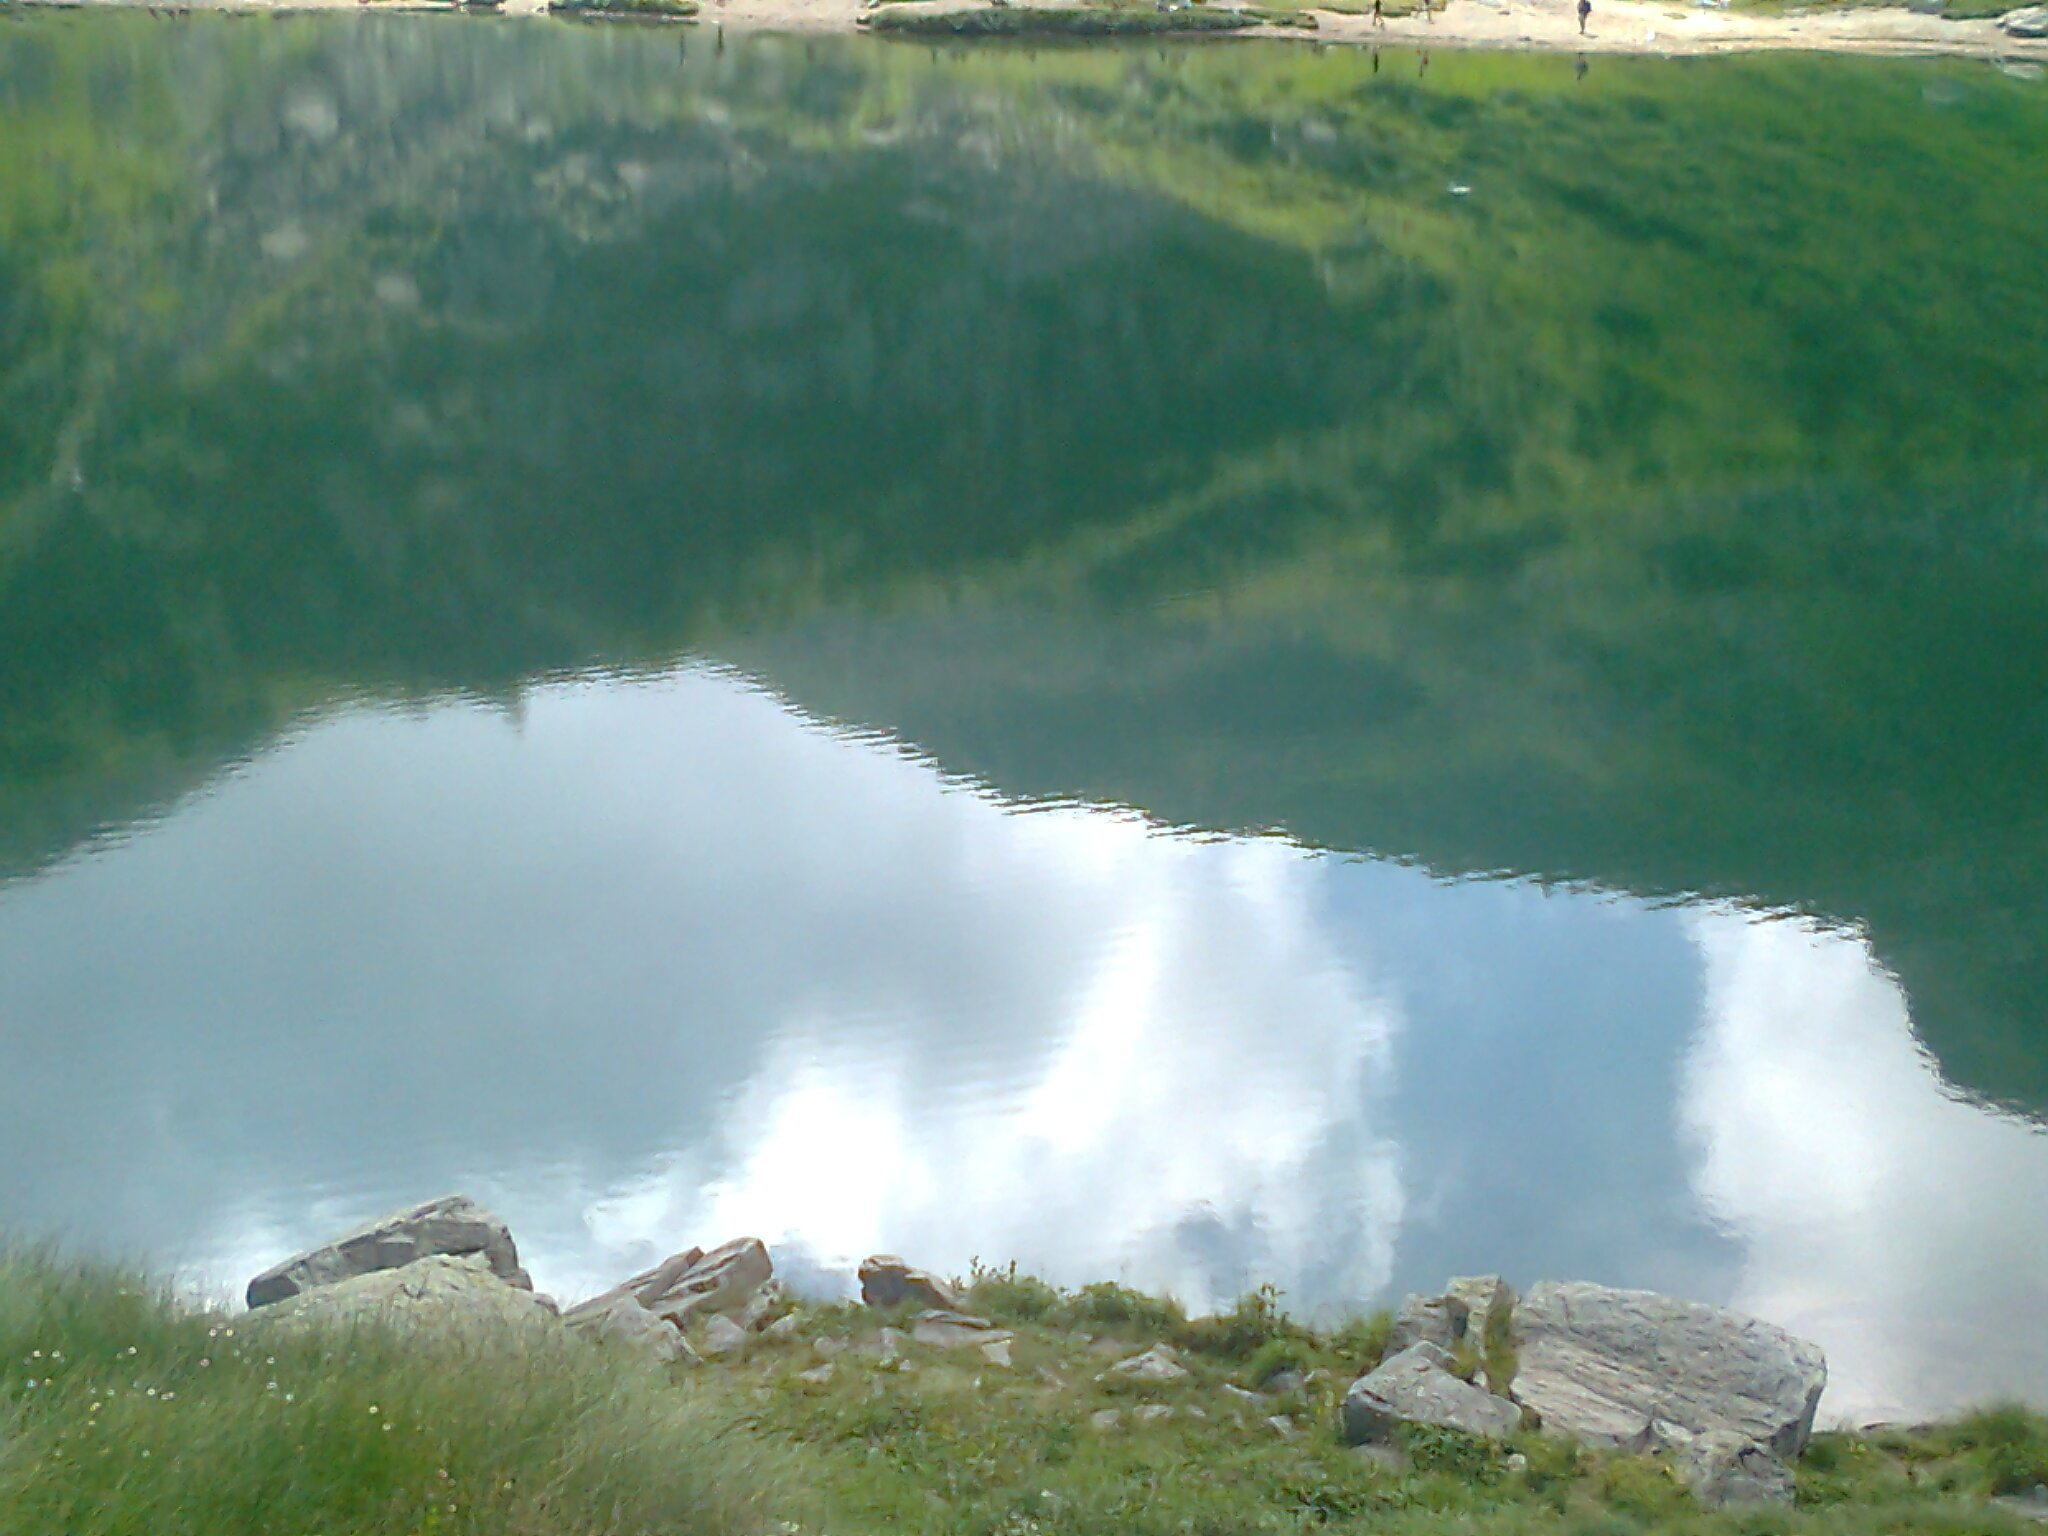 a lake in the mountains 13 1440x1080 - A lake in the mountains